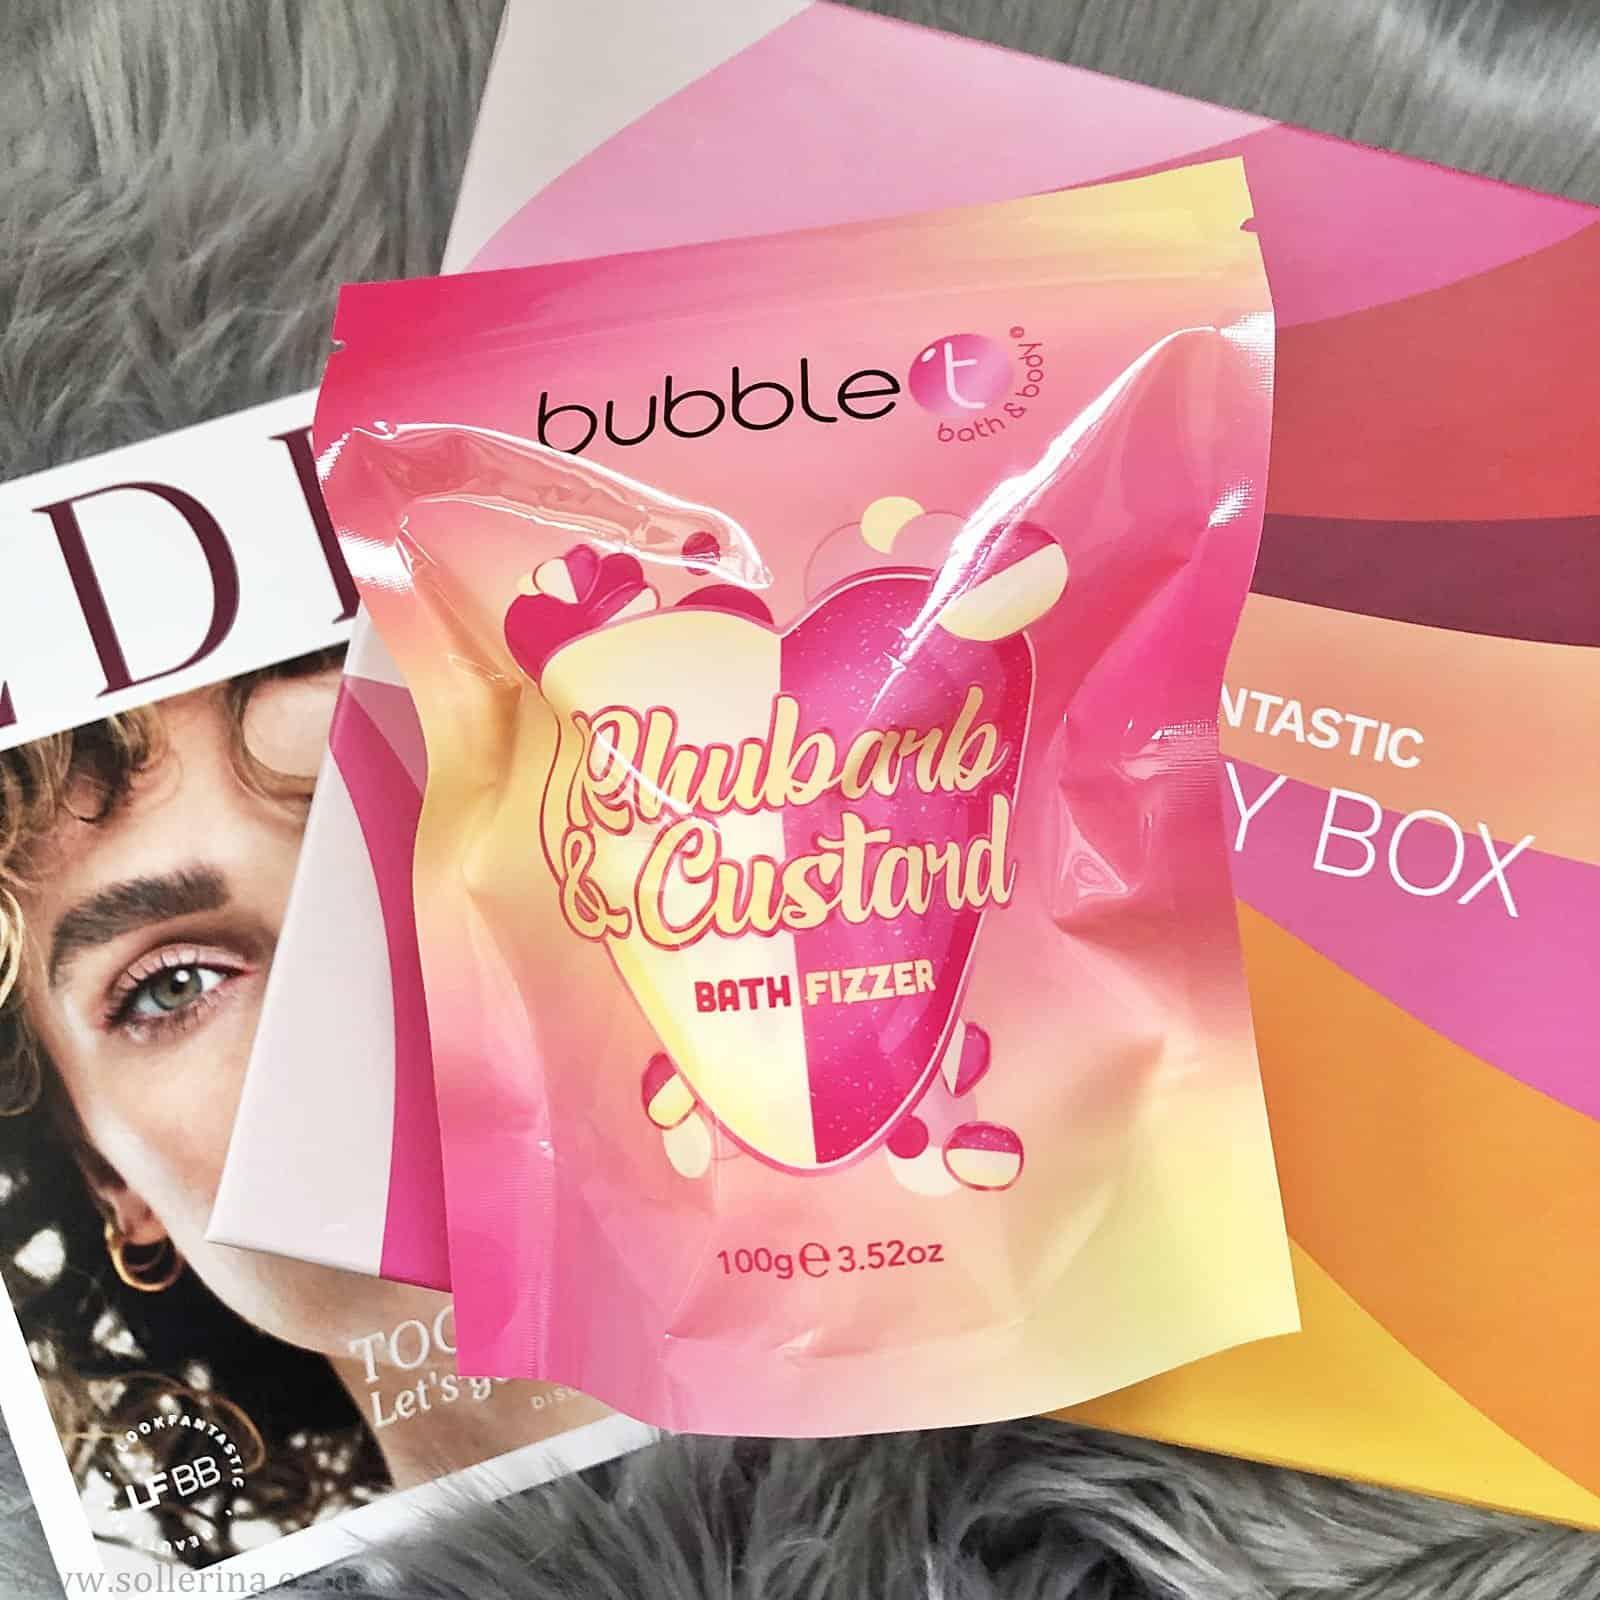 Bubble T – Rhubarb & Custard Bath Fizzer